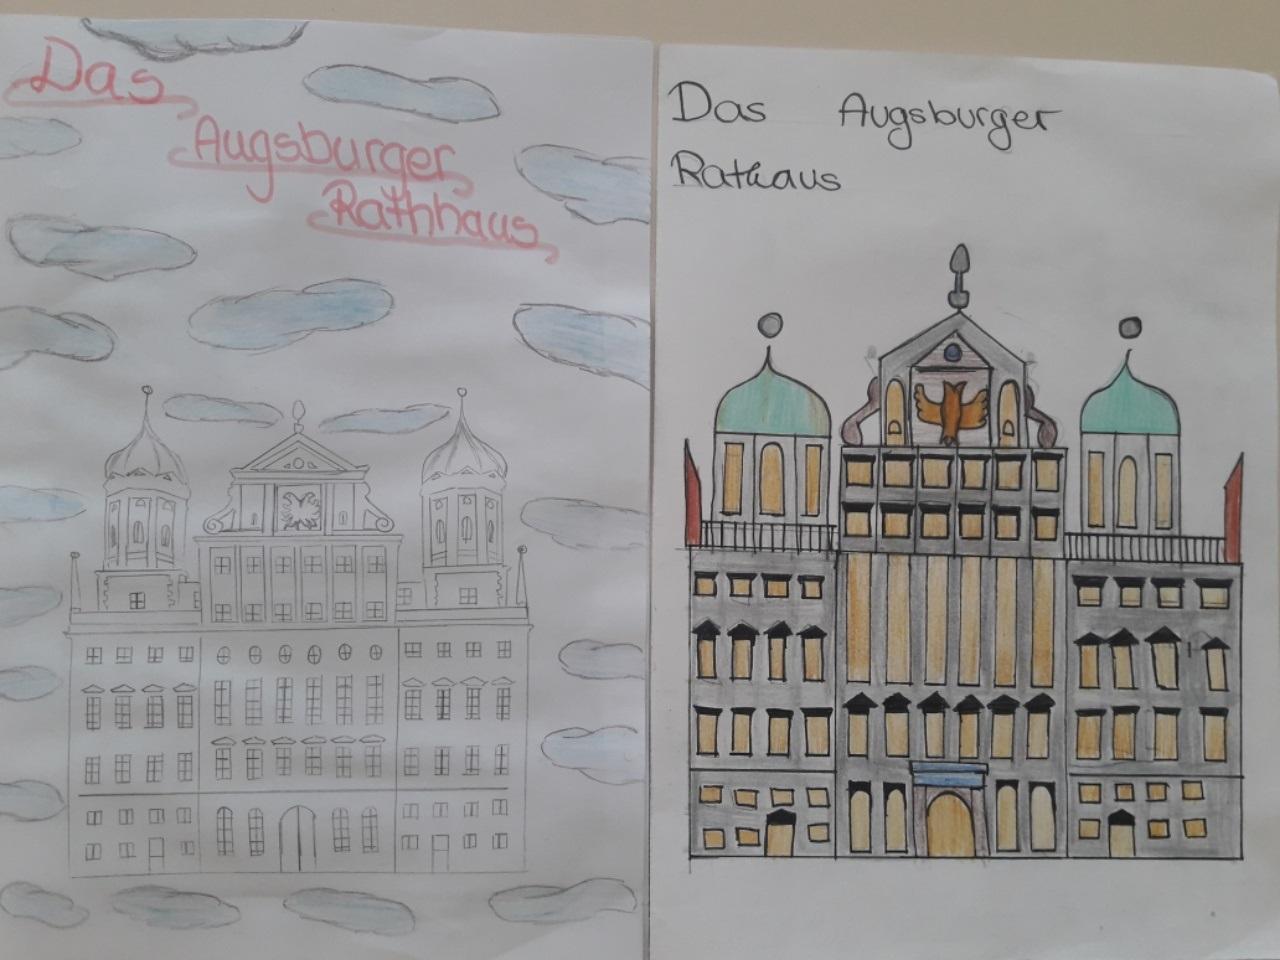 Renaissance pur - unser Augsburger Rathaus